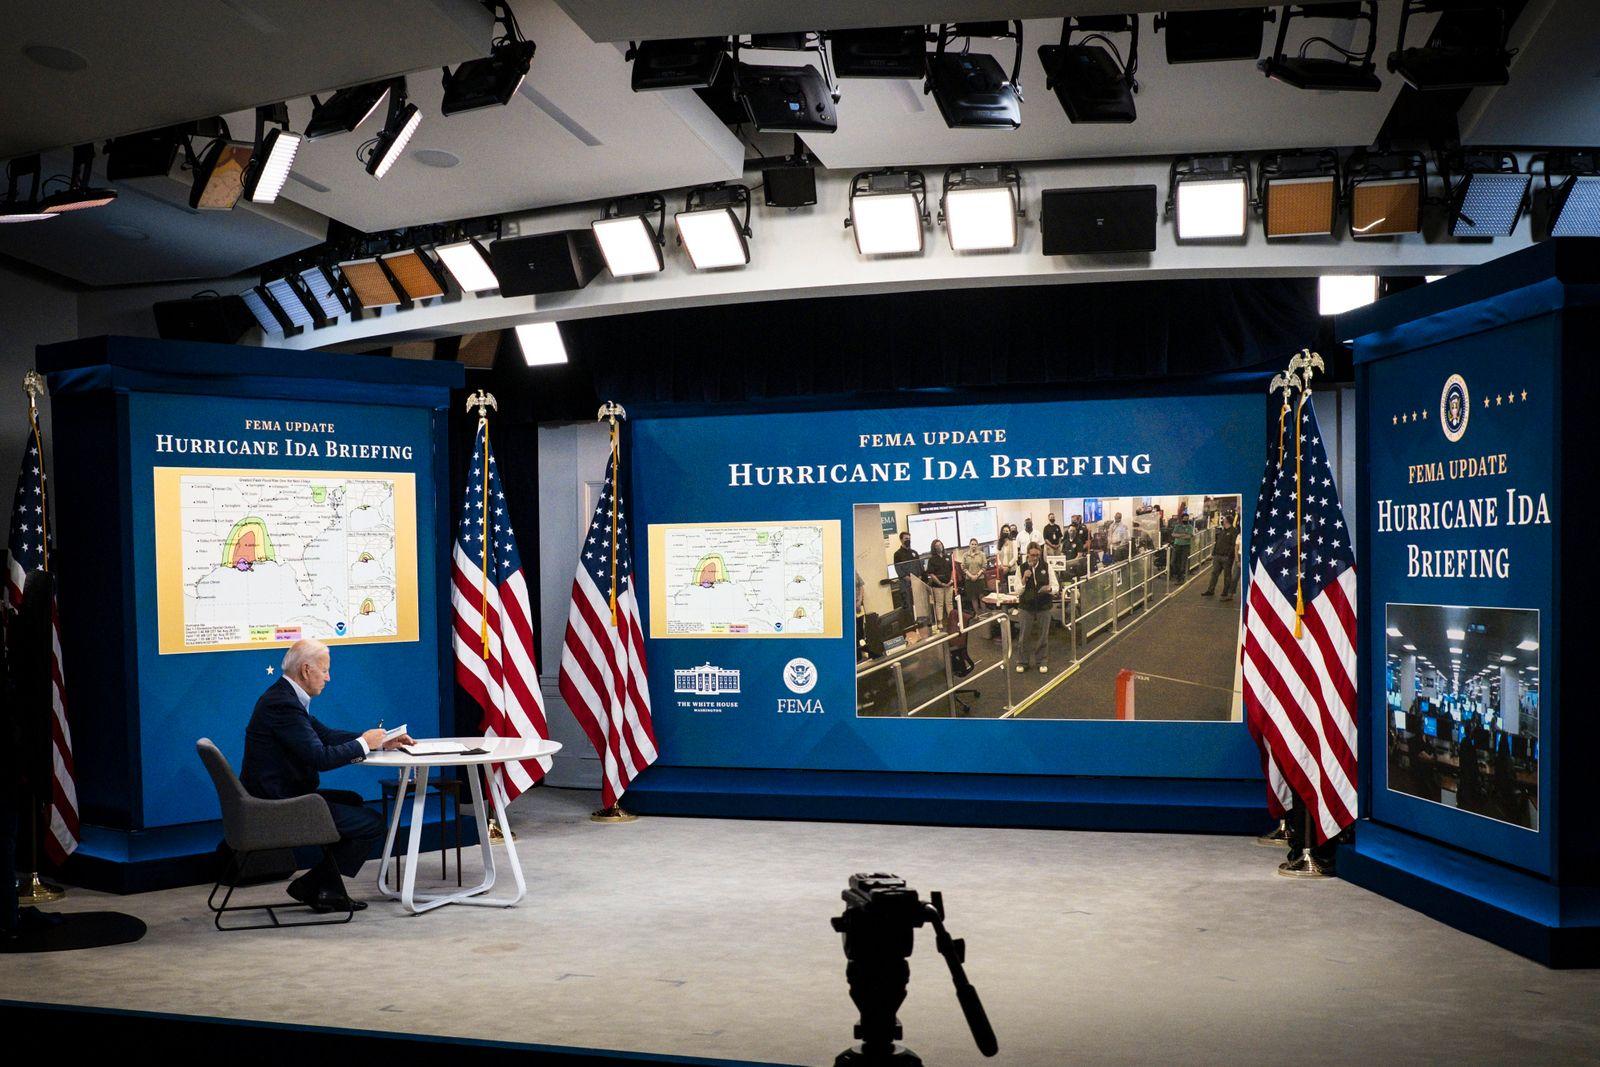 Hurrikan Ida: US Präsident Biden im FEMA Hauptquartier in Washington